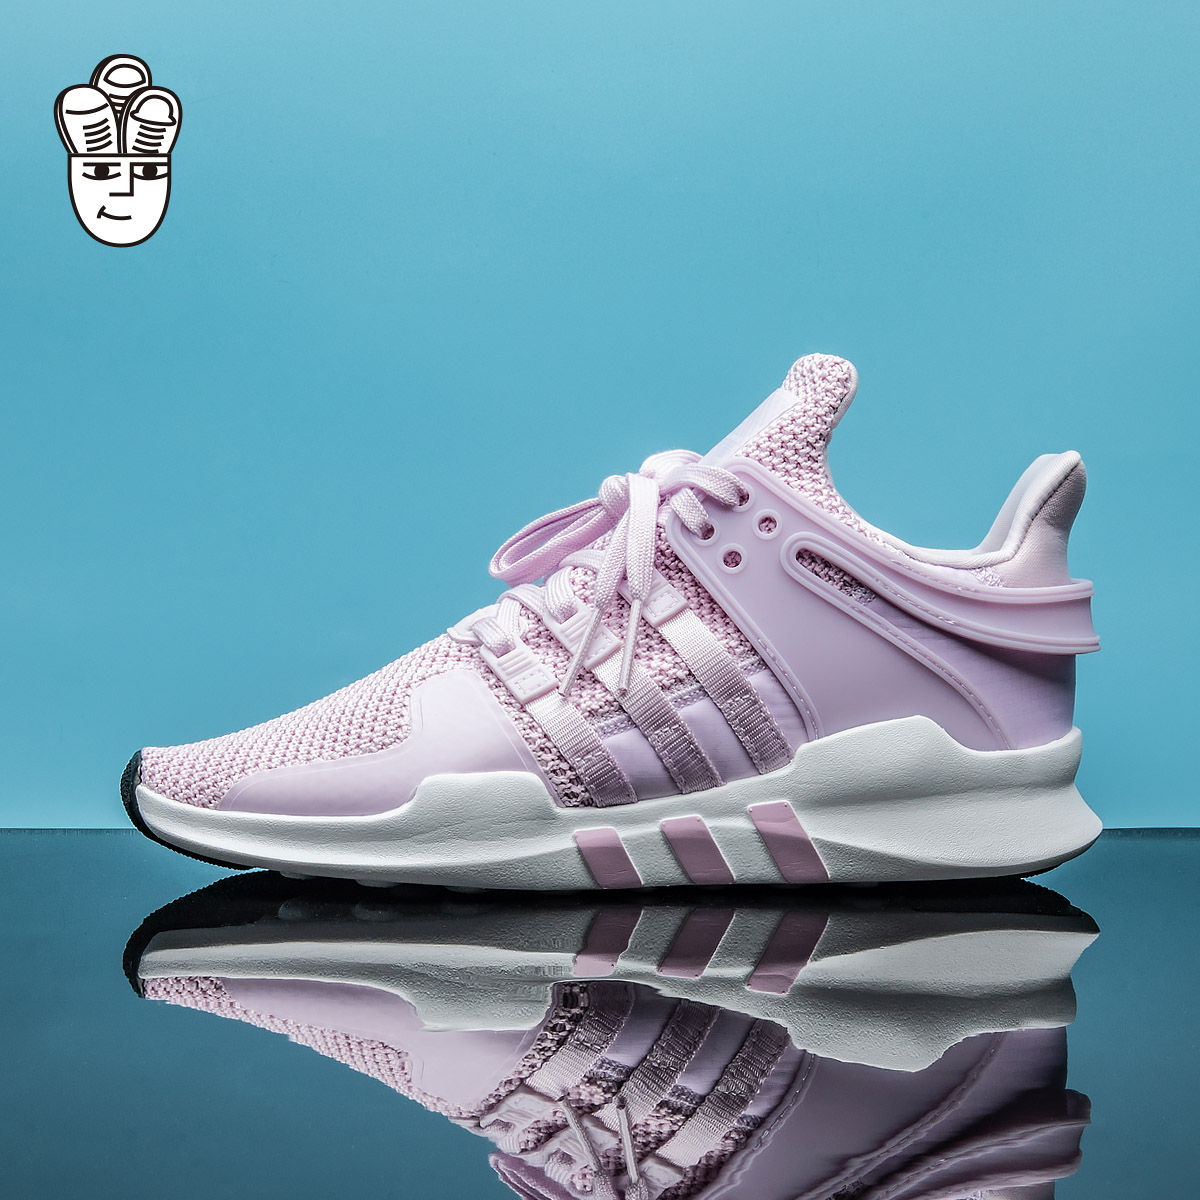 Adidas EQT Support ADV Snake 三叶草男鞋女鞋GS  跑步鞋 运动鞋